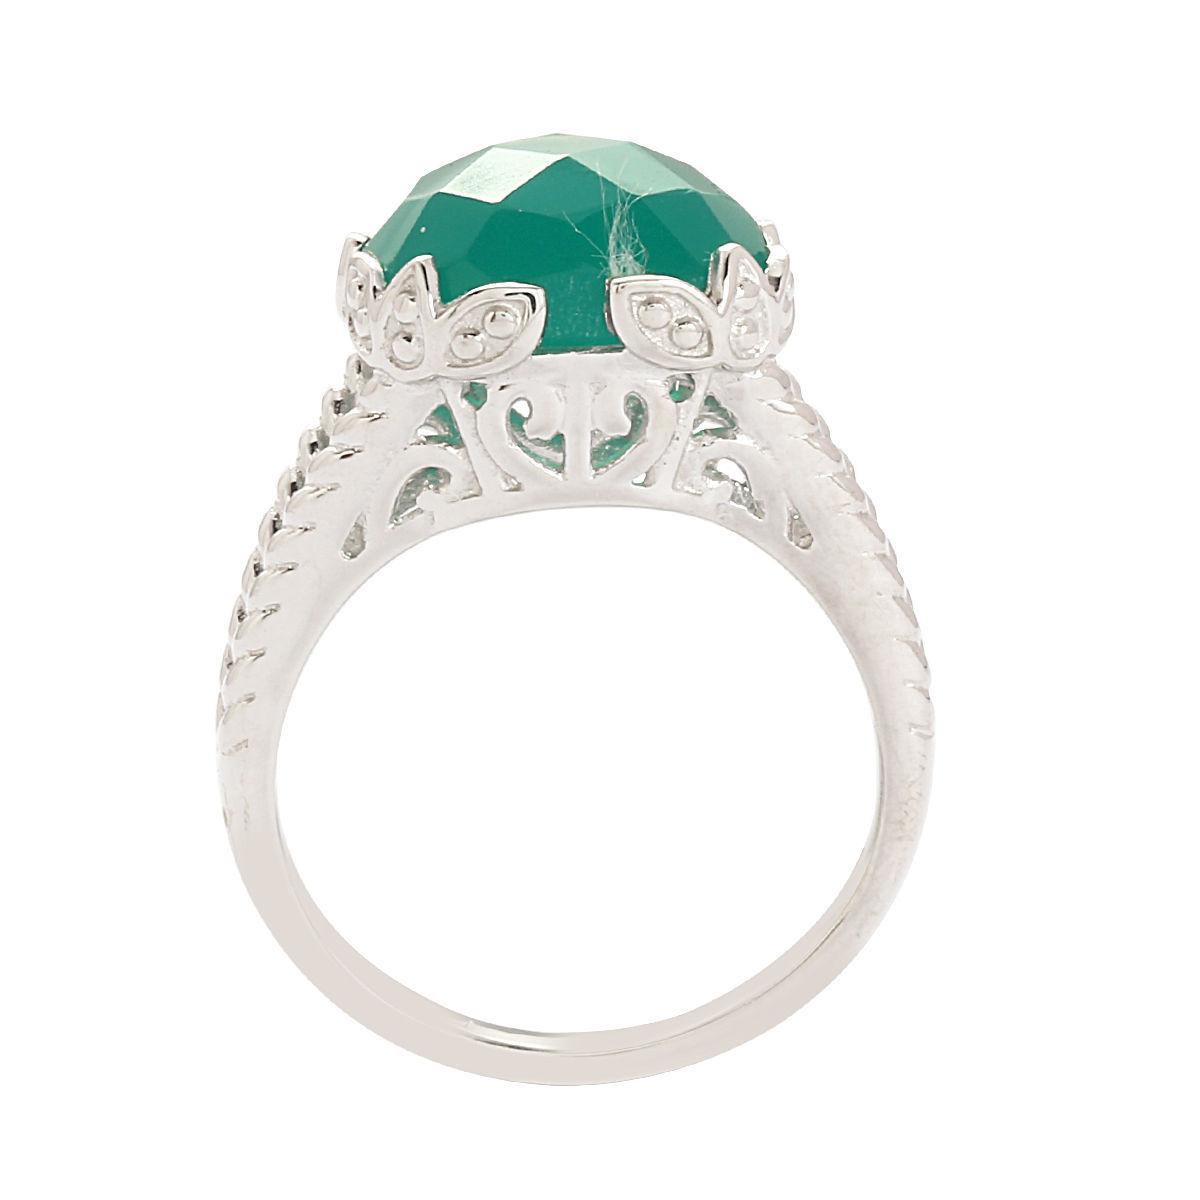 Shine Jewel 12 MM Green Onyx 925 Sterling Silver Jewelry Ring SZ 8 SHRI0280